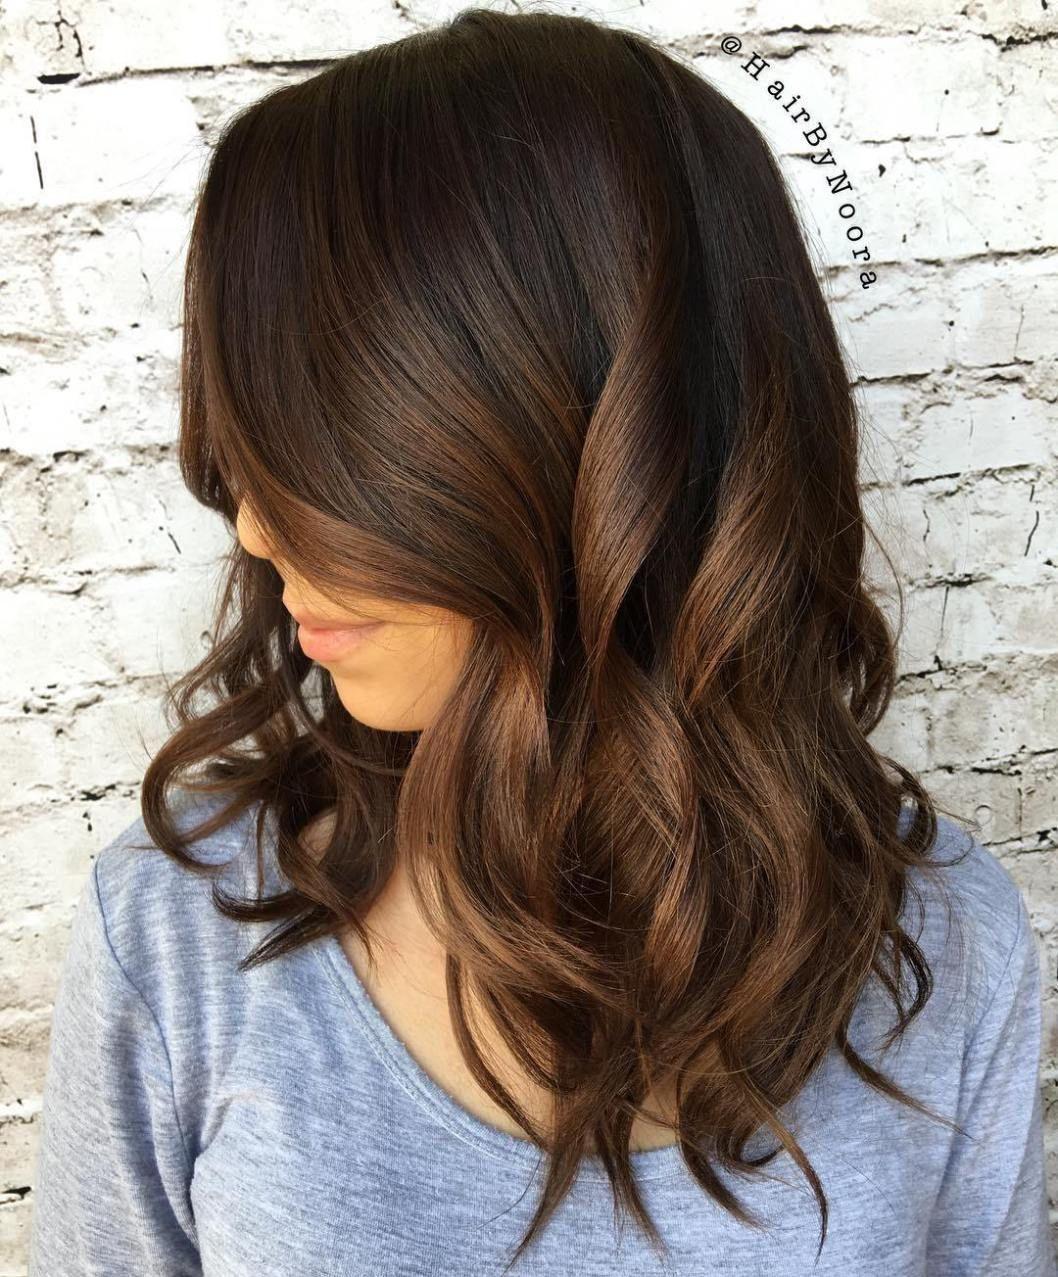 Brunette ombre hair hair ideas pinterest brunette ombre ombre hair and brunettes - Ombre hair brune ...